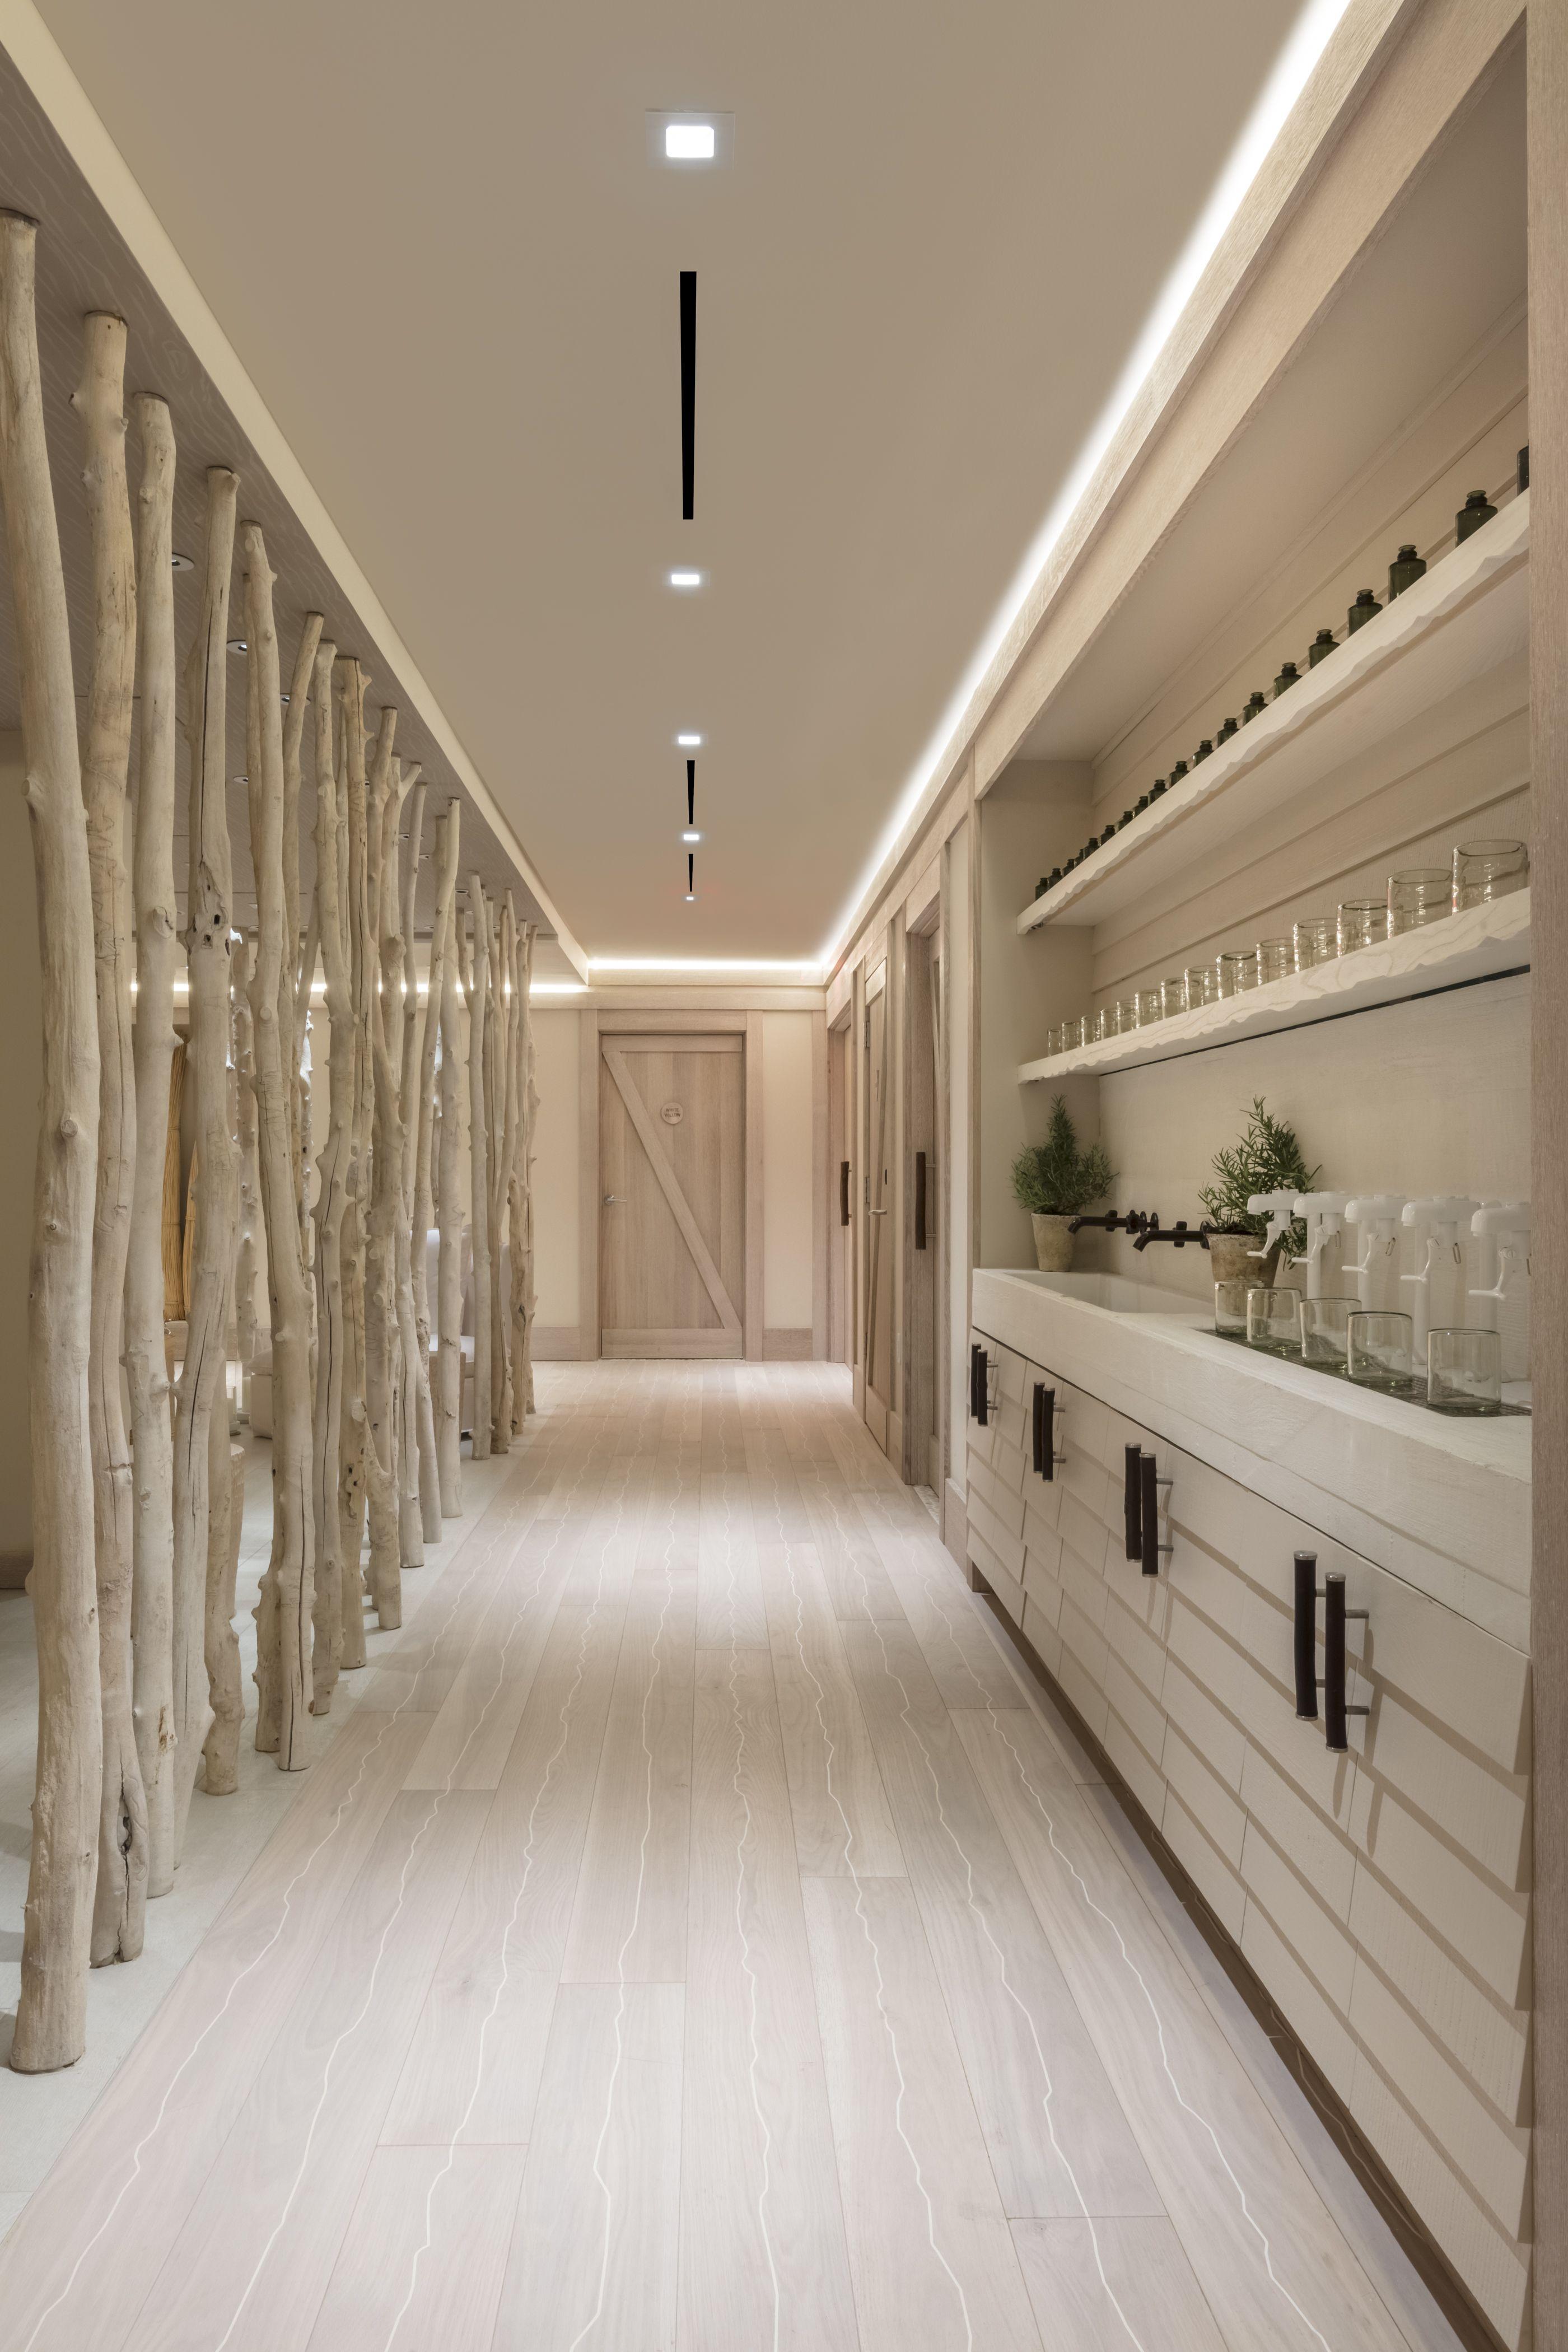 Pin By Bamford On Bamford Spa Miami 1 Hotel South Beach Babington House Bespoke Bathroom Spa